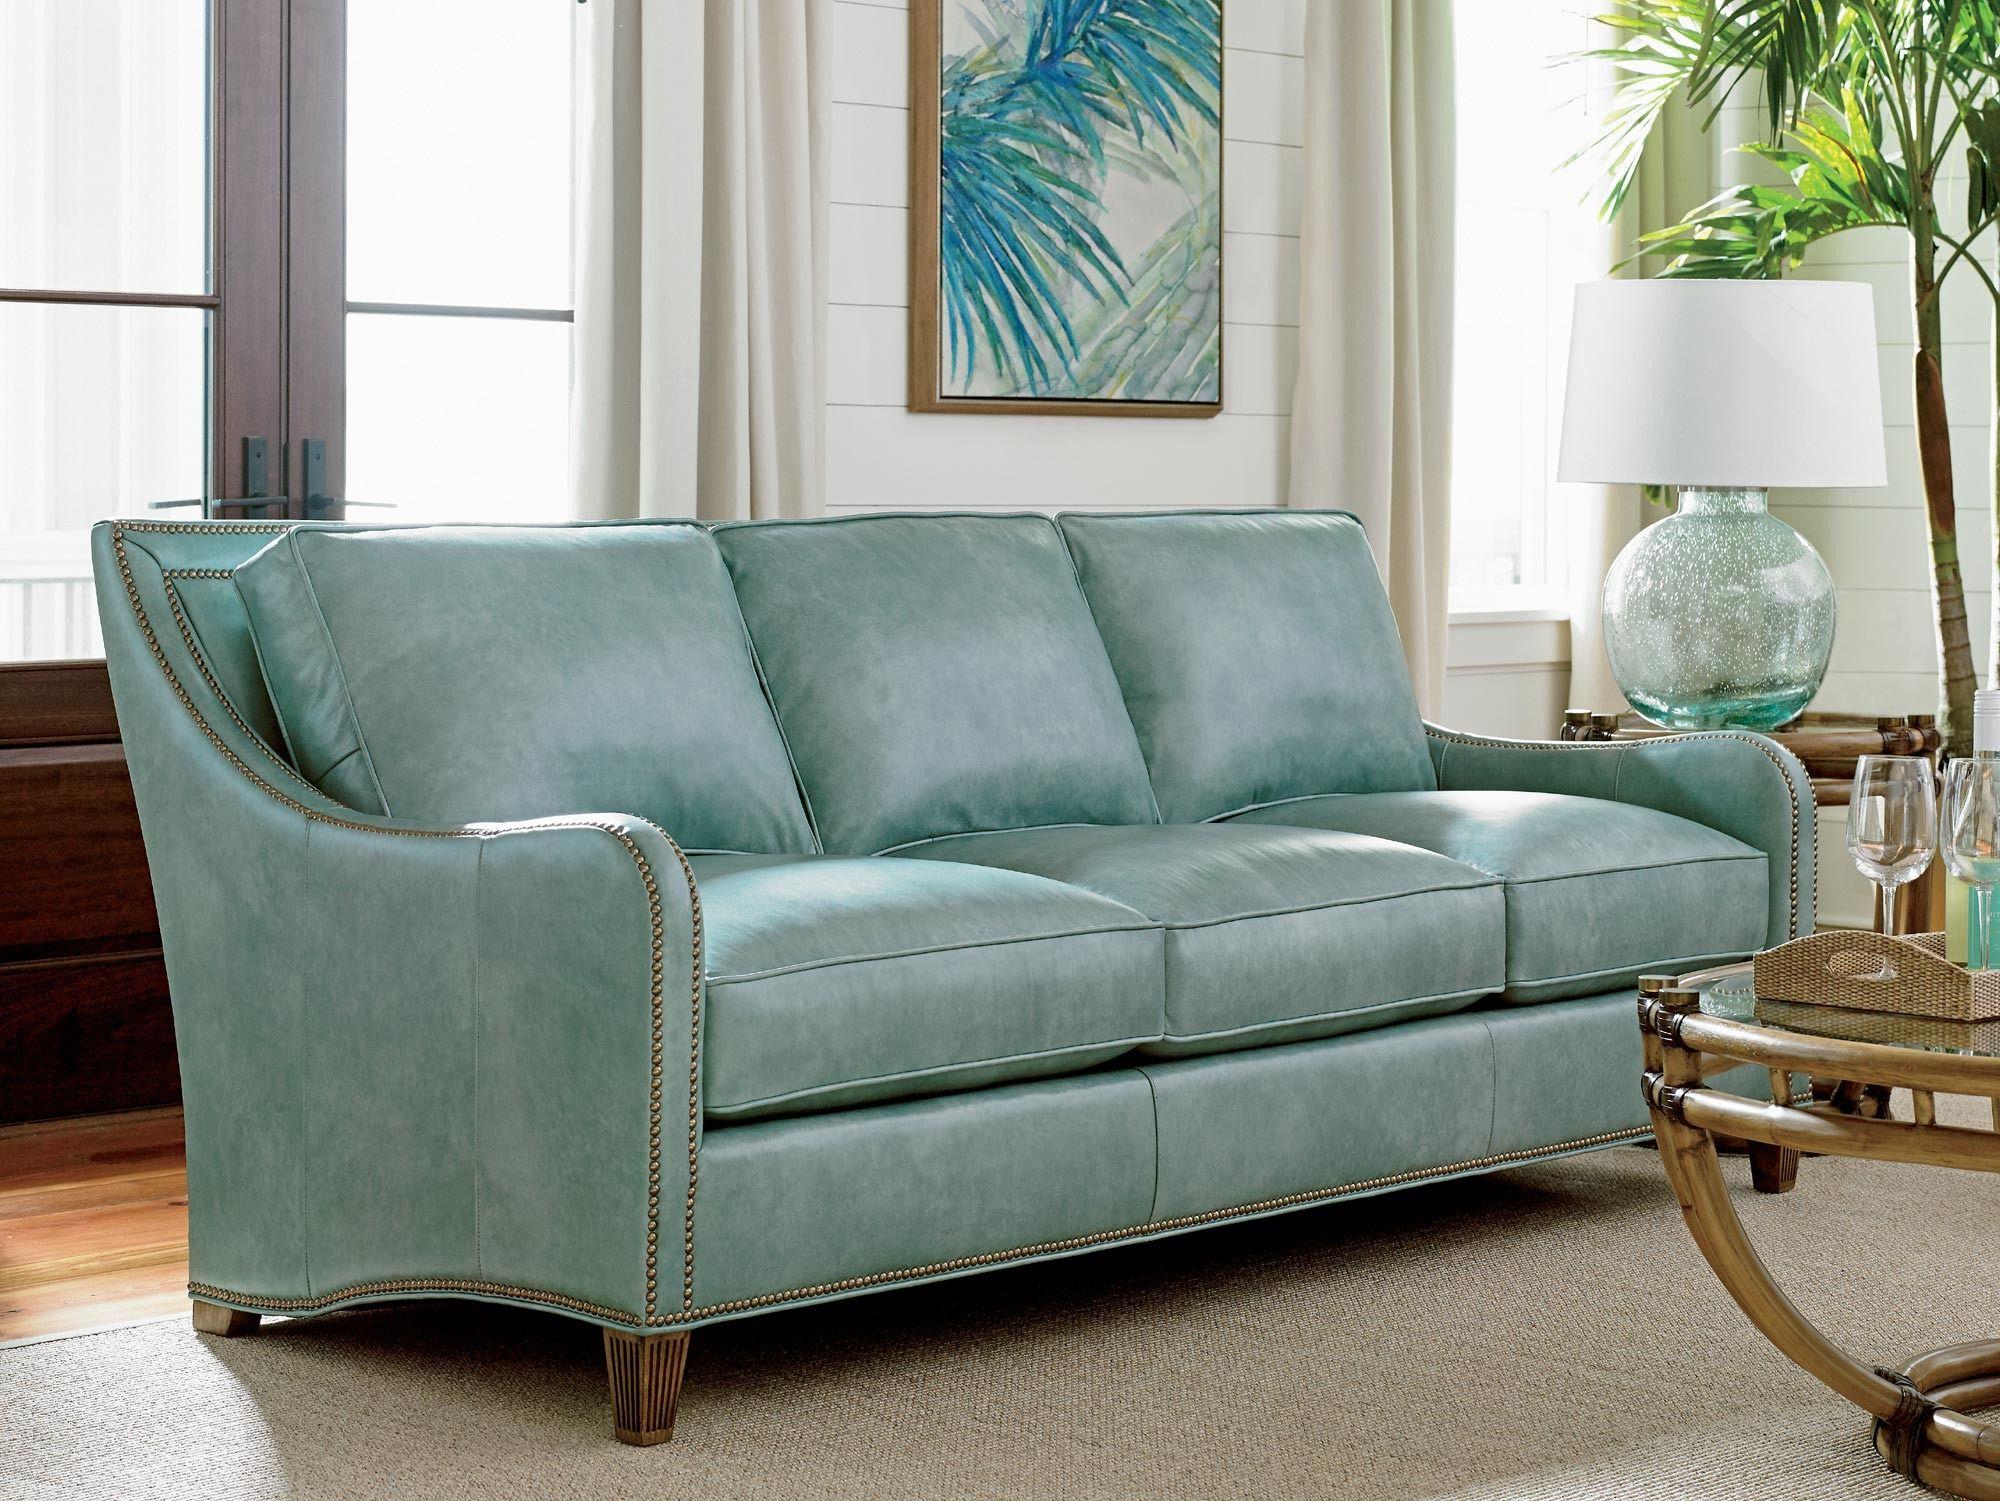 Twin Palms Koko Leather Sofa In Teal Tommy Bahama Home Home